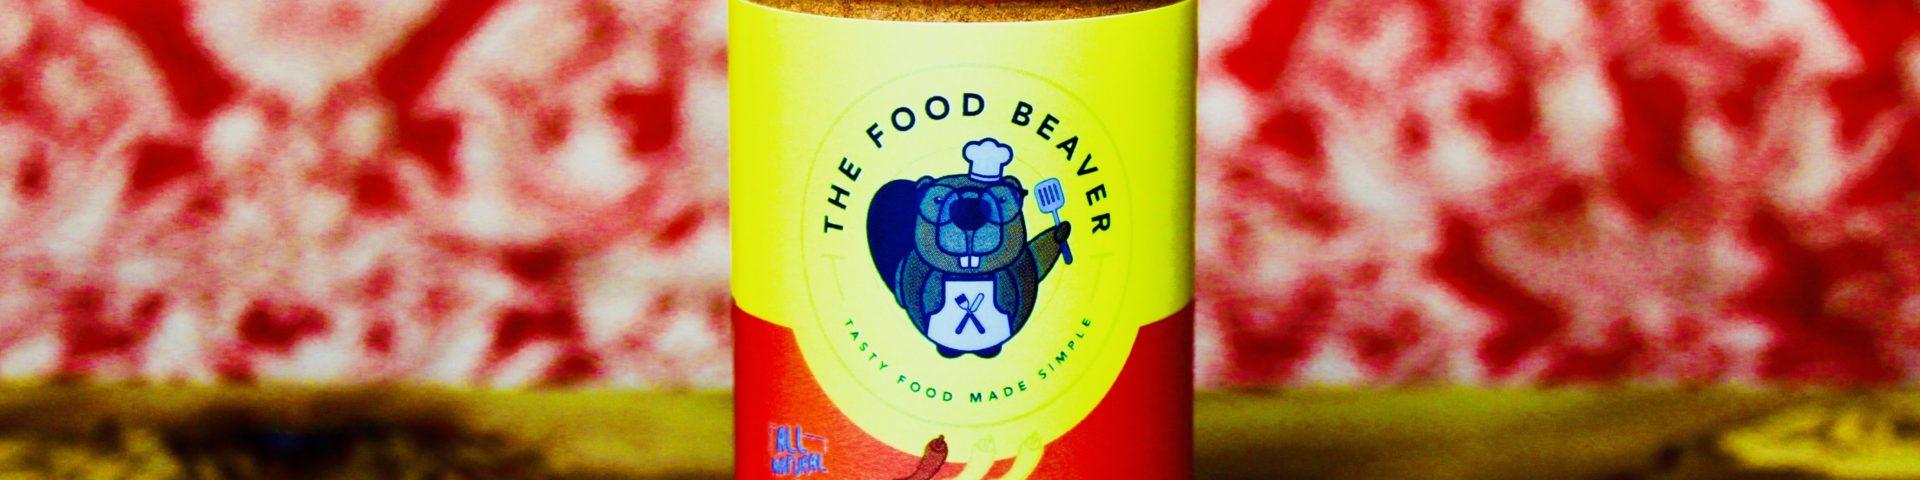 The Food Beaver Tandoori Seasoning & Marinade - All Natural Ingredients